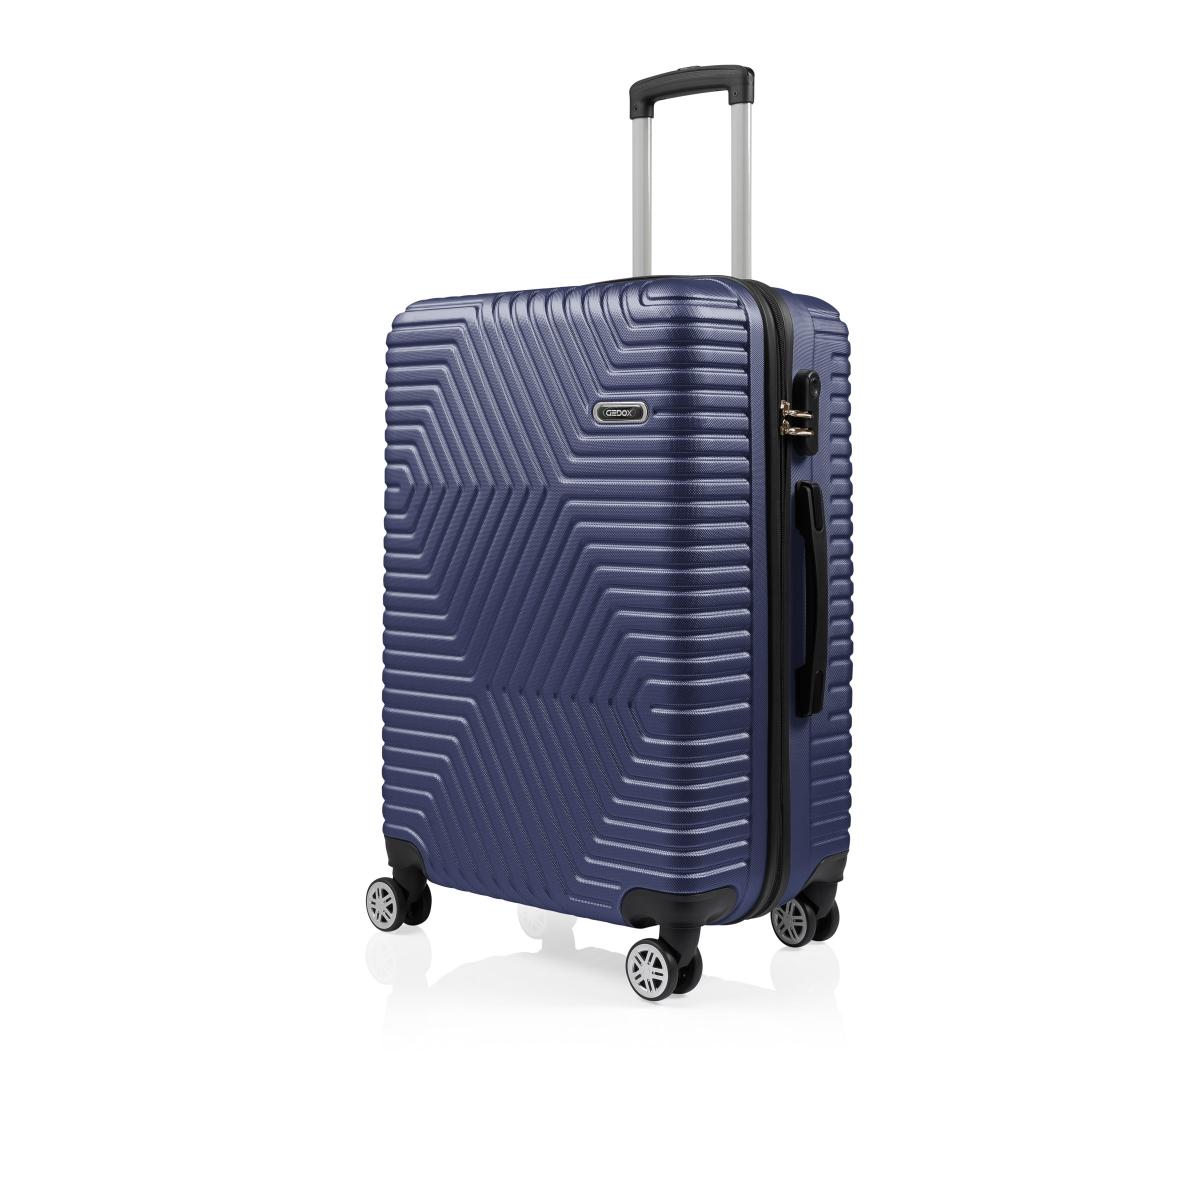 G&D Polo Suitcase ABS 3'lü Lüx Valiz Seyahat Seti - Model:600.04 Lacivert